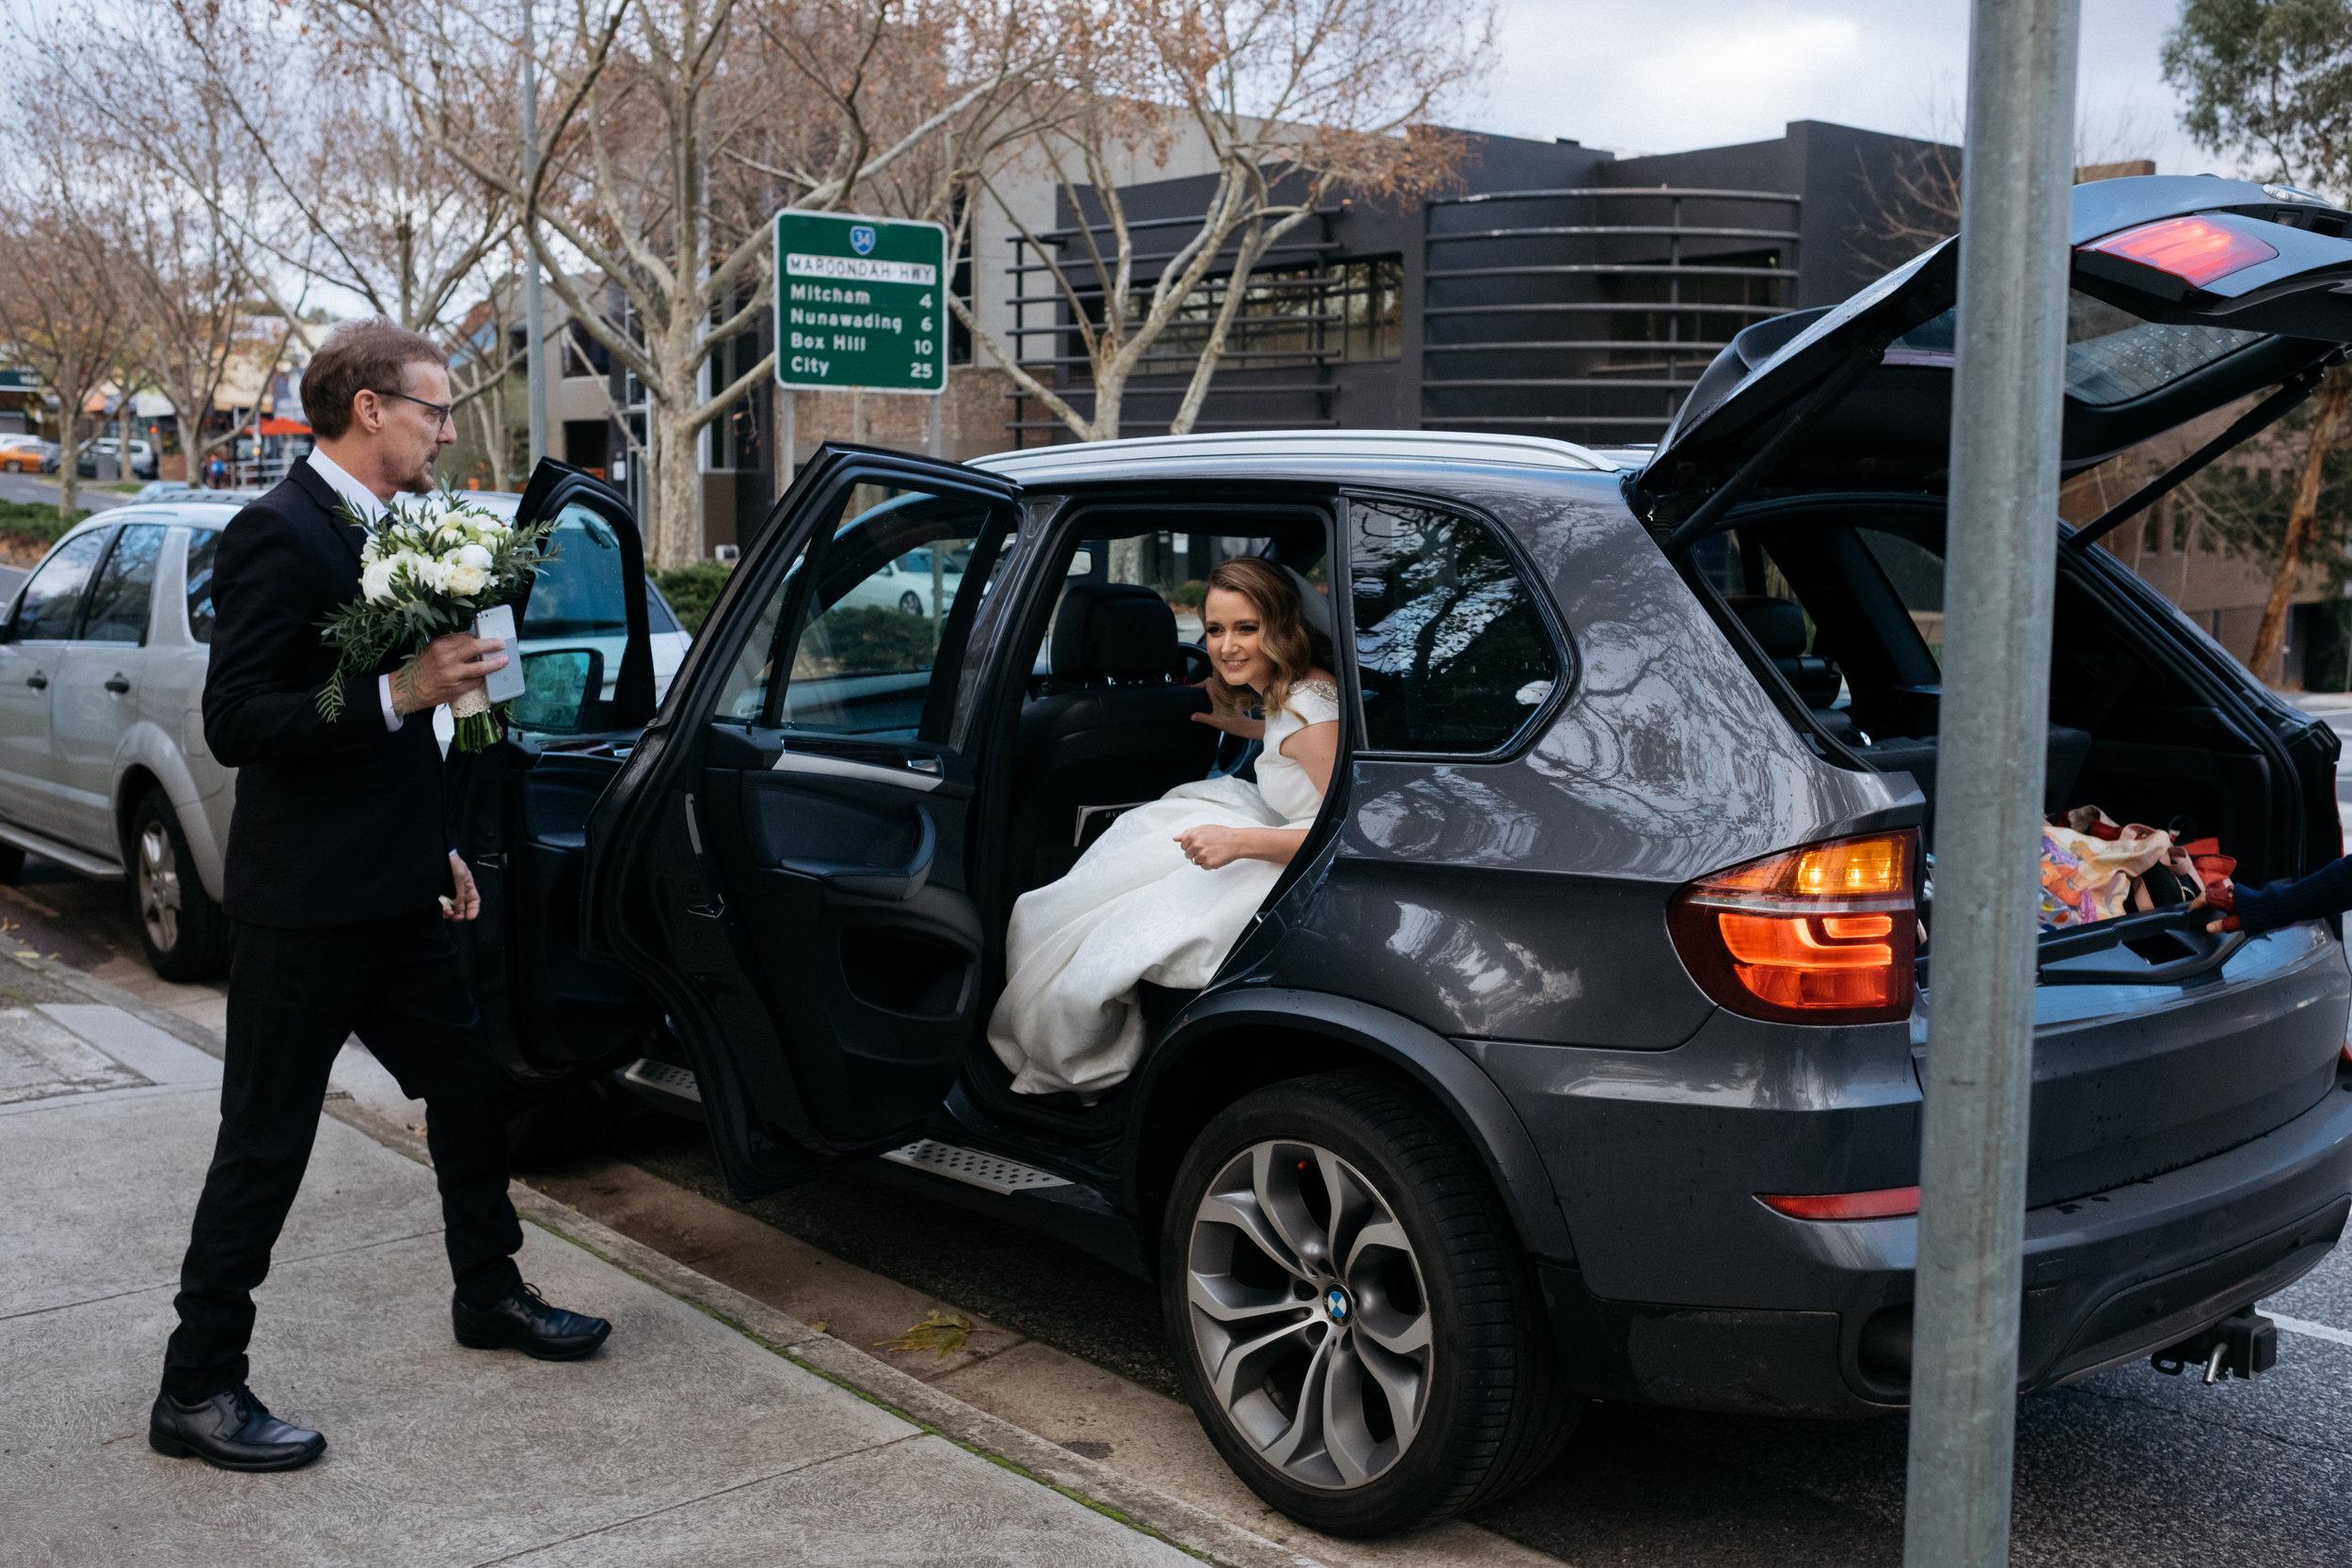 Bride arrives at venue in an uber